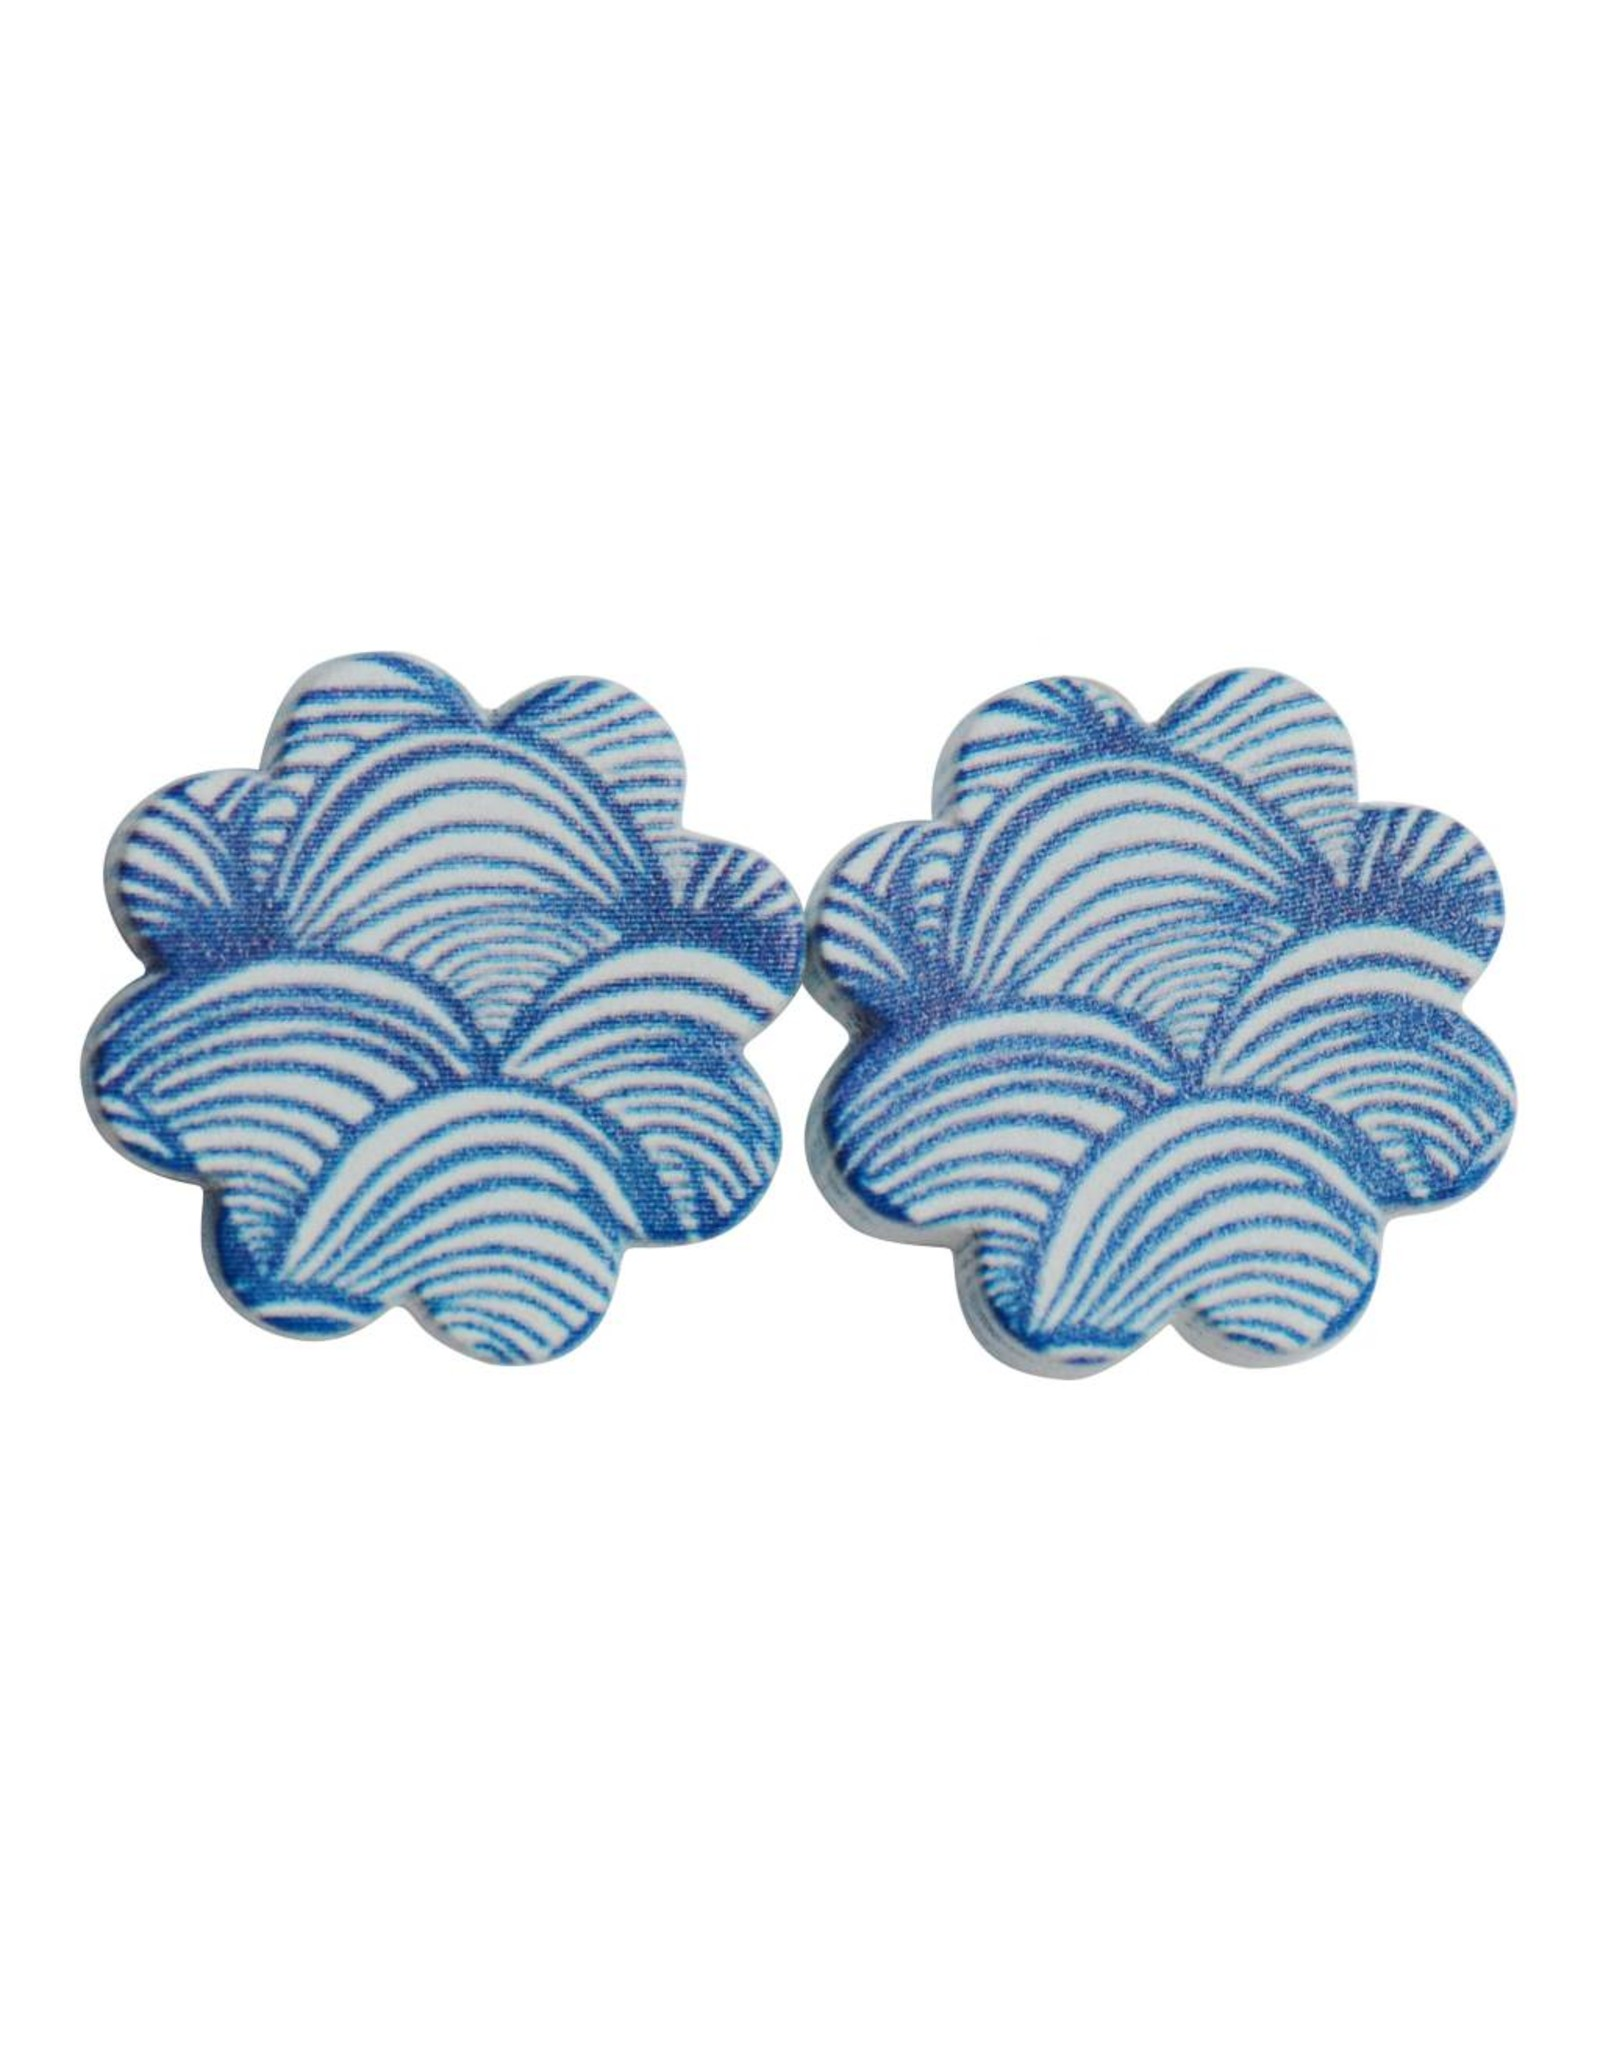 oorbEllen hout stekers golfjes blauw bloem